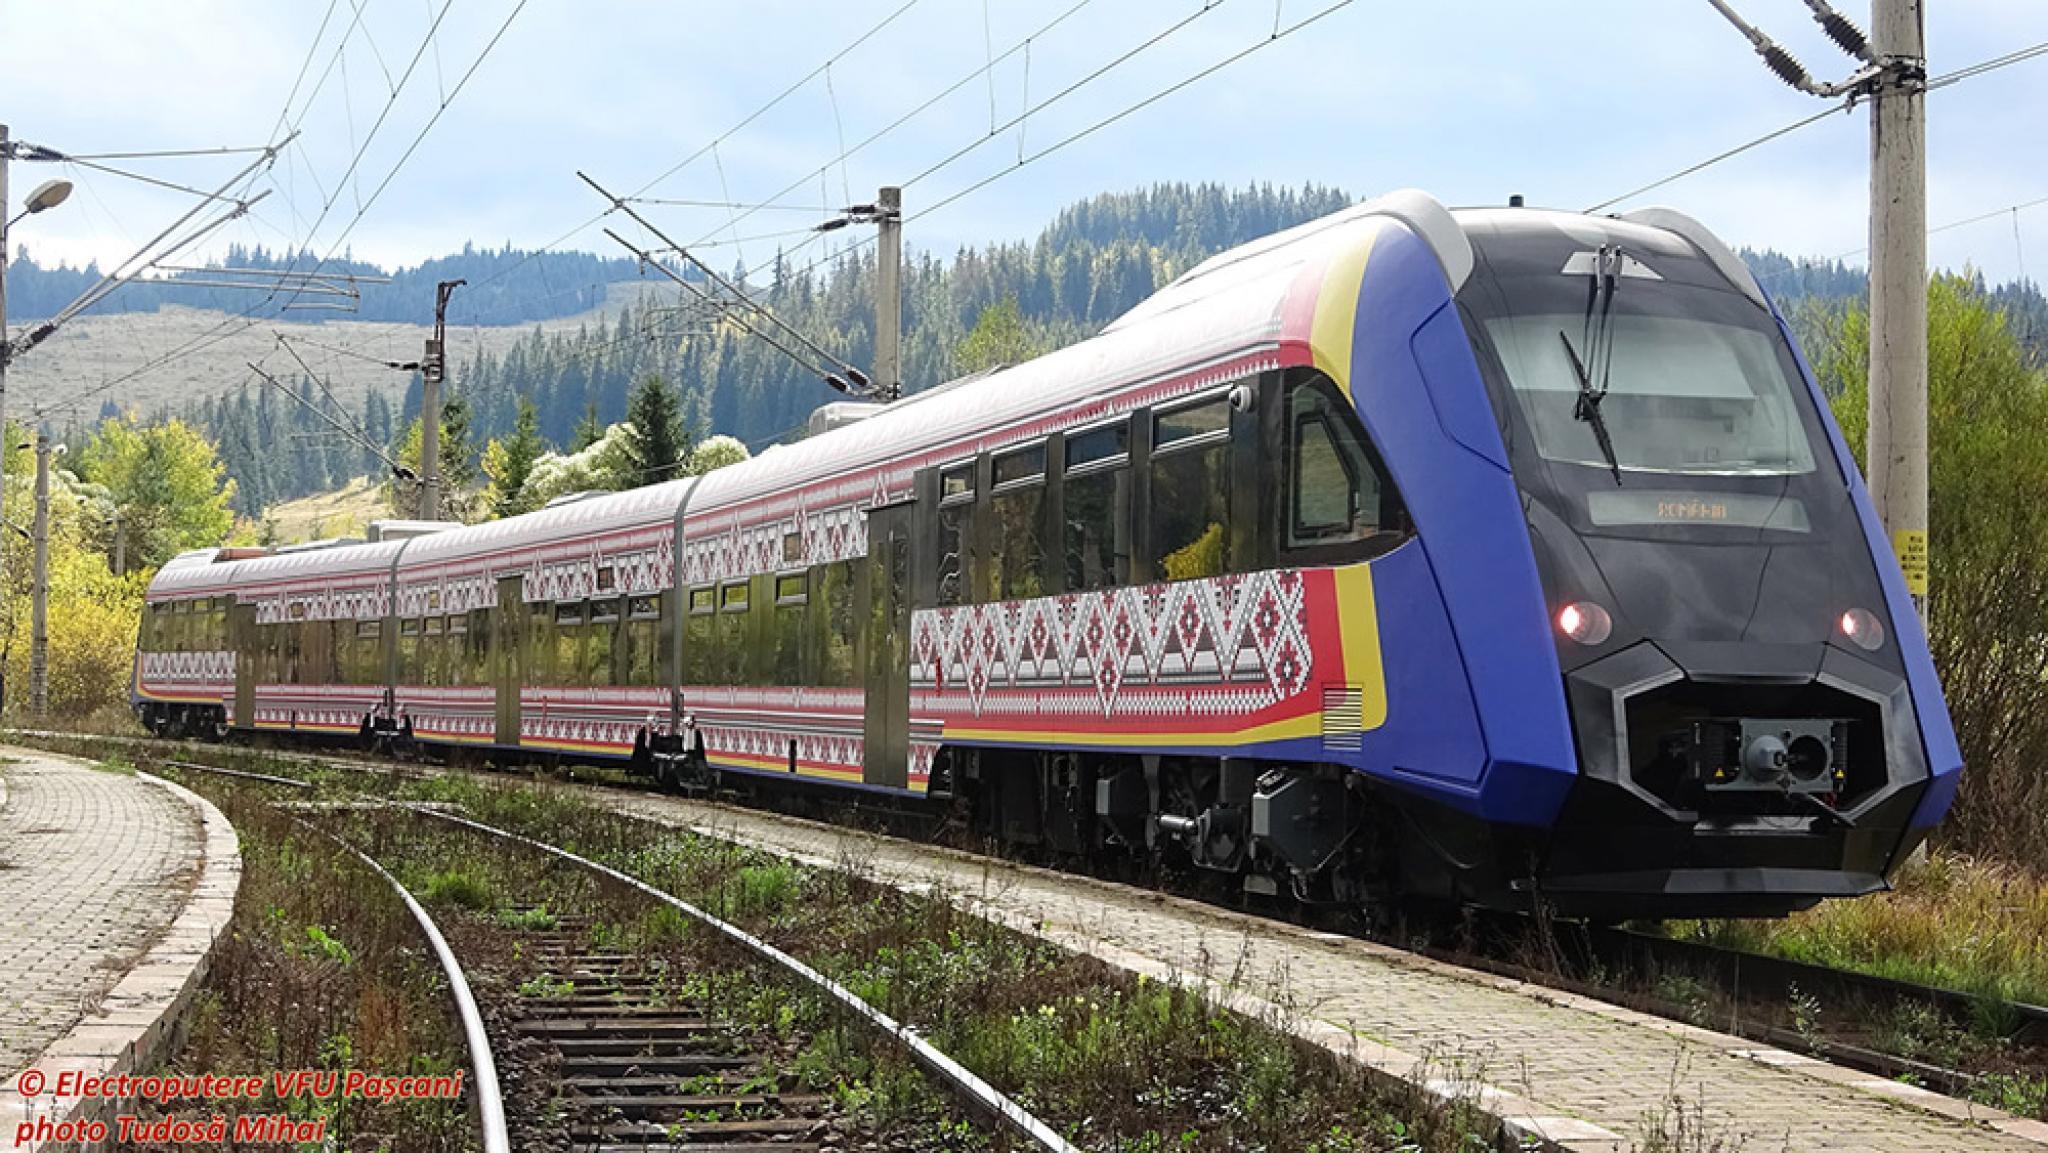 Tren nou romanesc testat pe zona Mestecanis Automotorul va iesi in curand pe piata